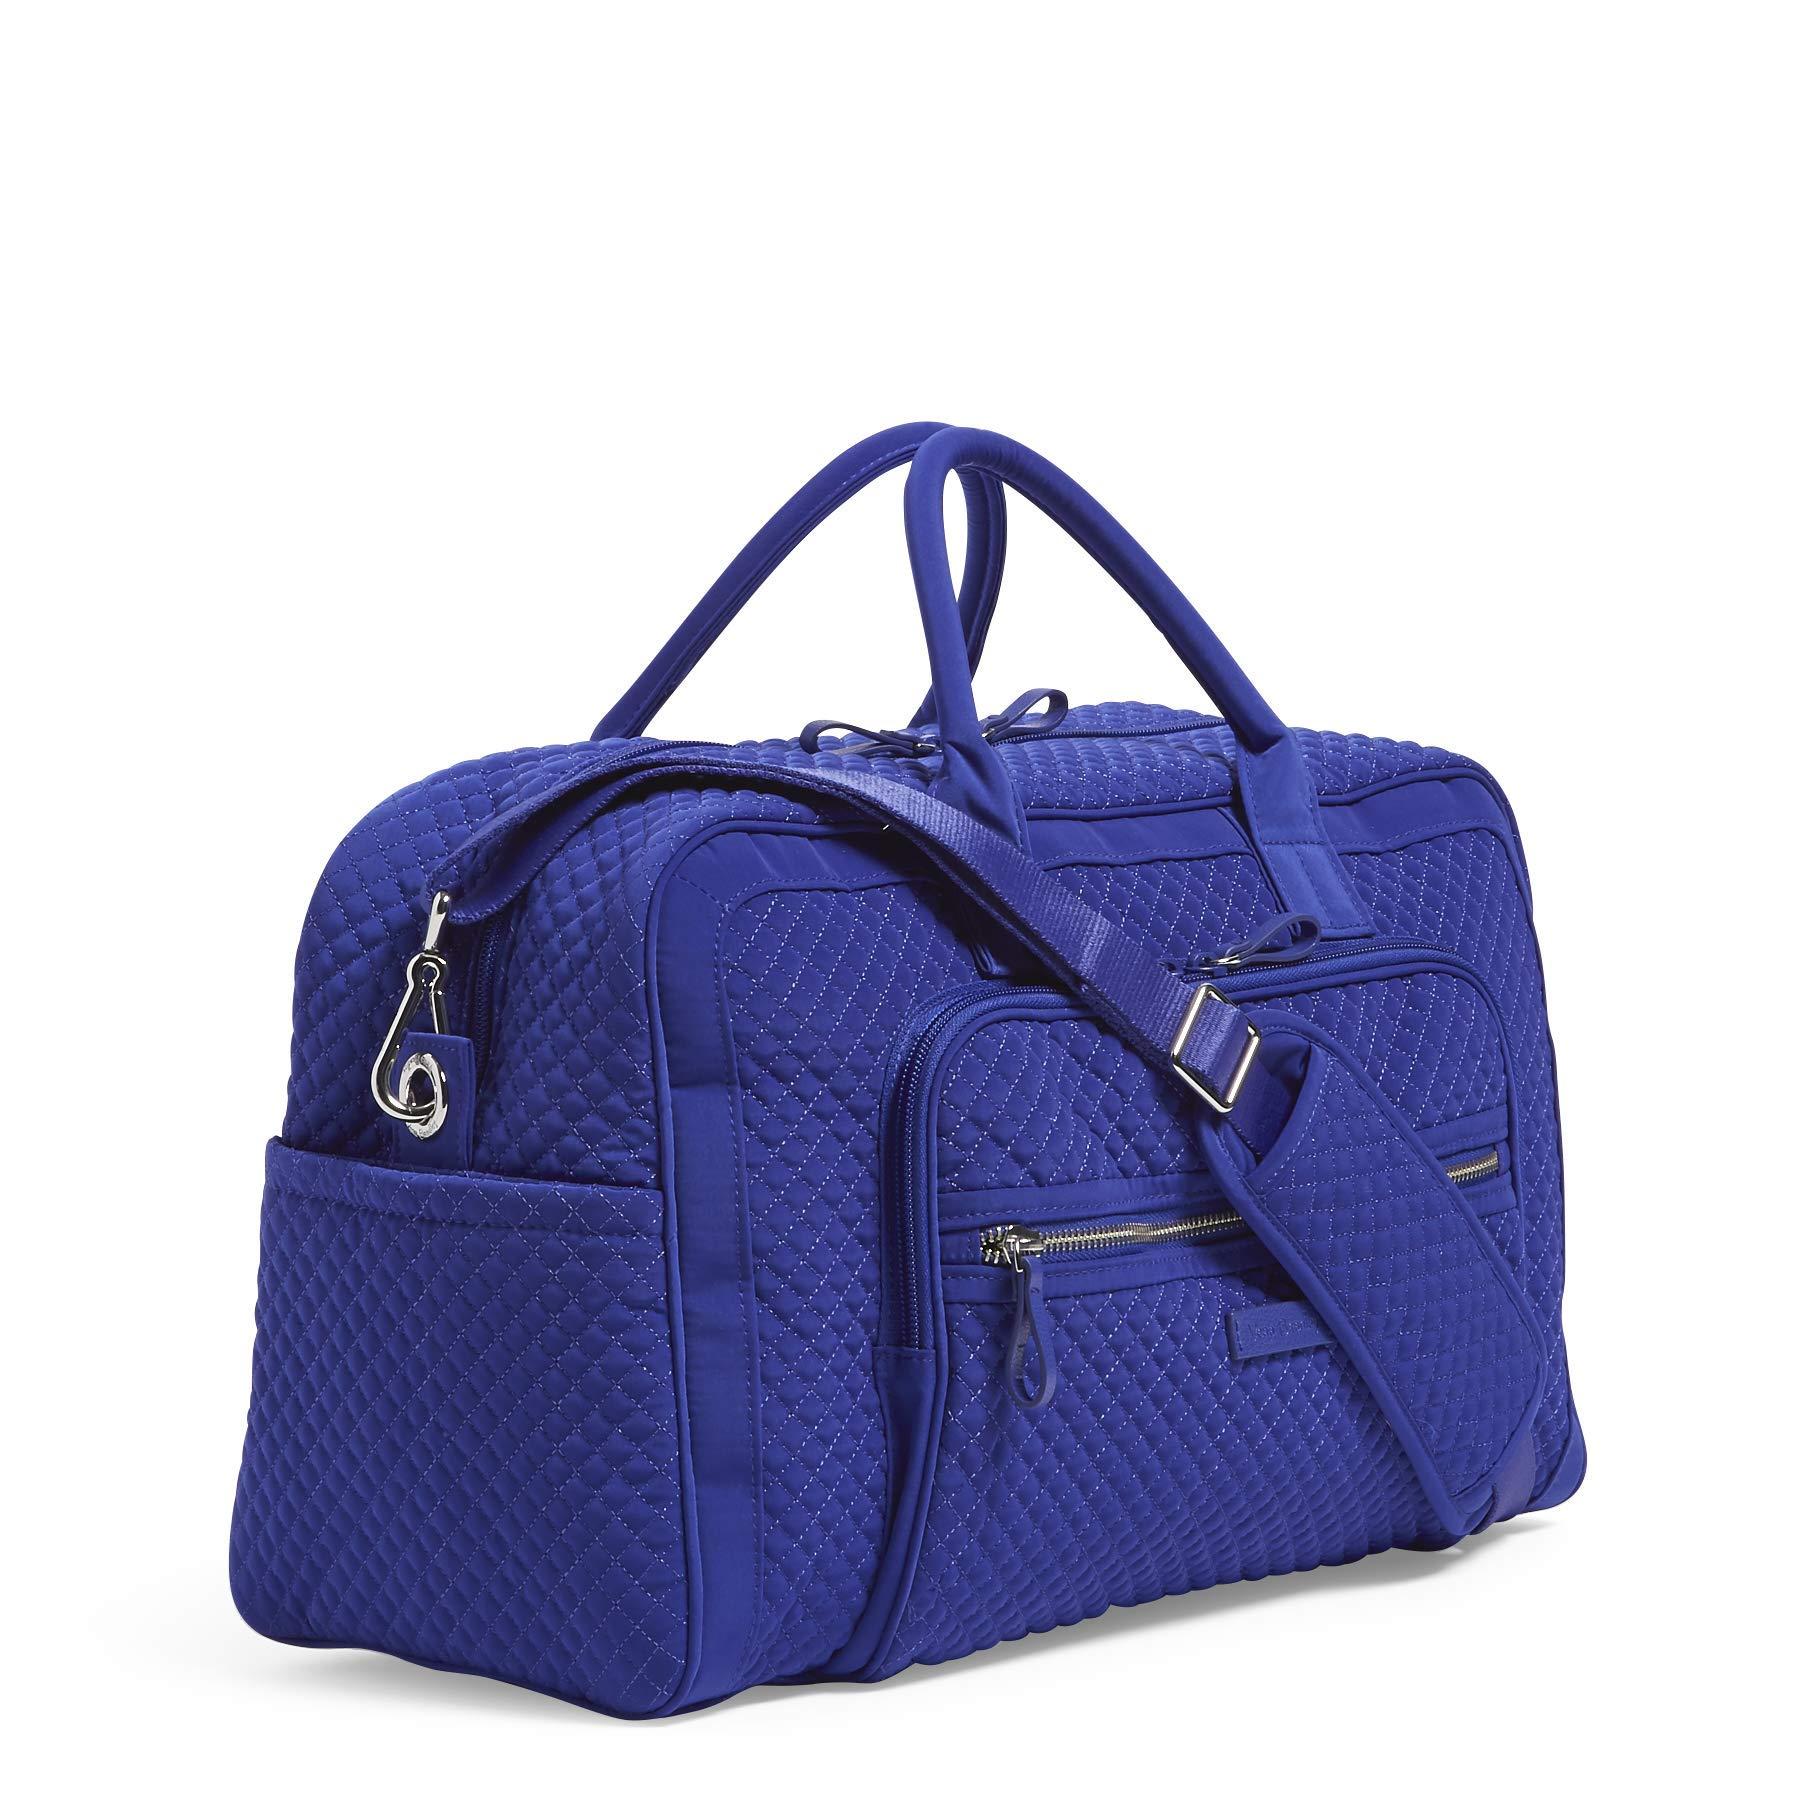 Vera Bradley Iconic Compact Weekender Travel Bag Vera,  gage Blue, One Size by Vera Bradley (Image #2)